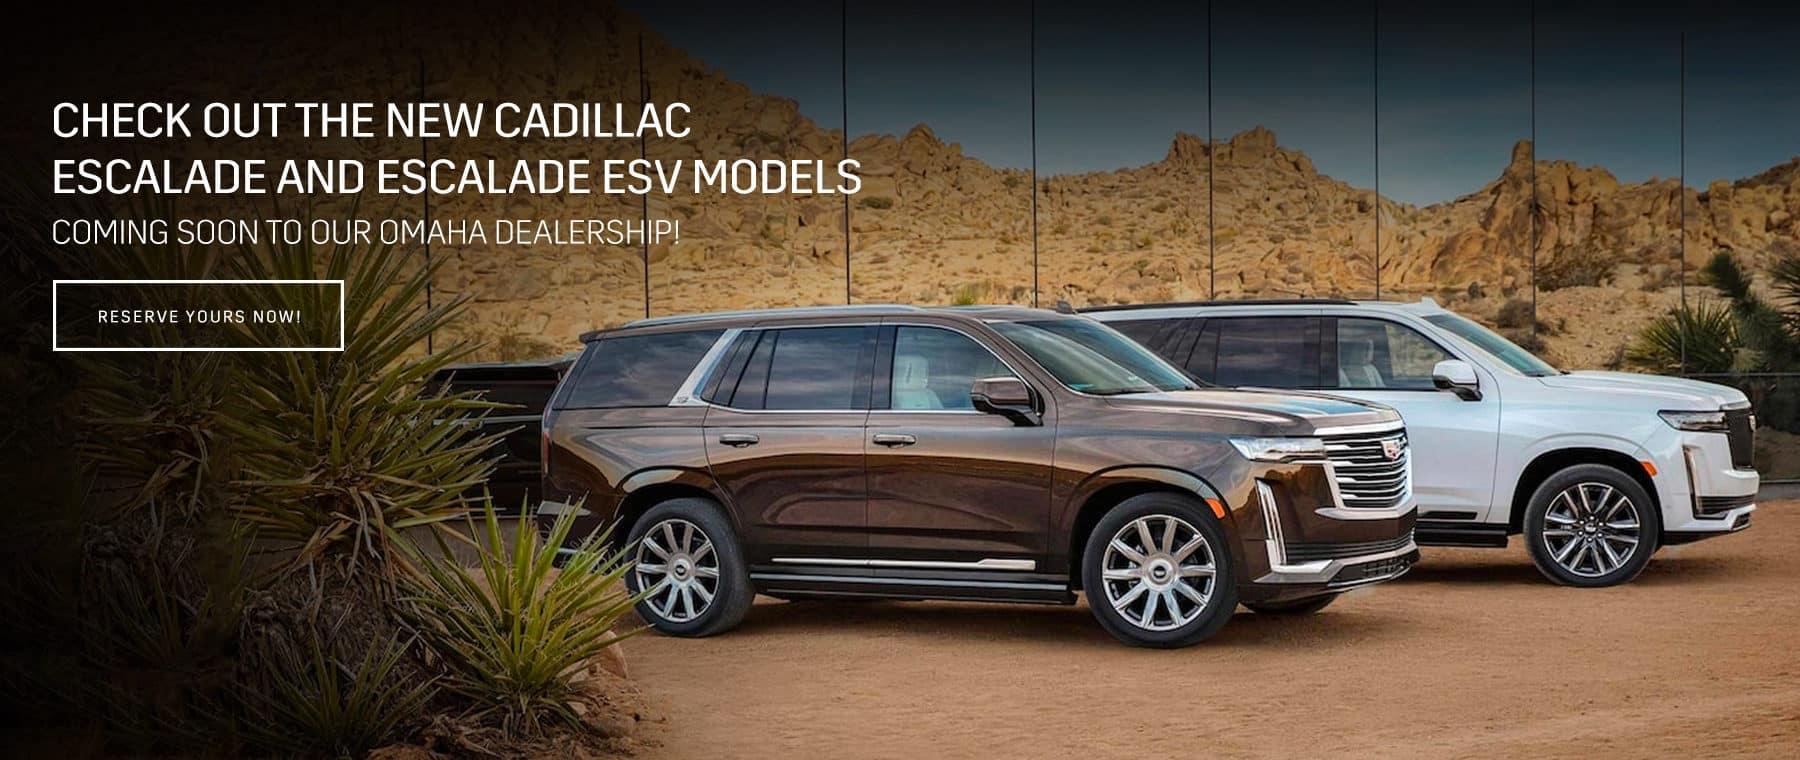 Check out the new Cadillac Escalade and Escalade ESV models